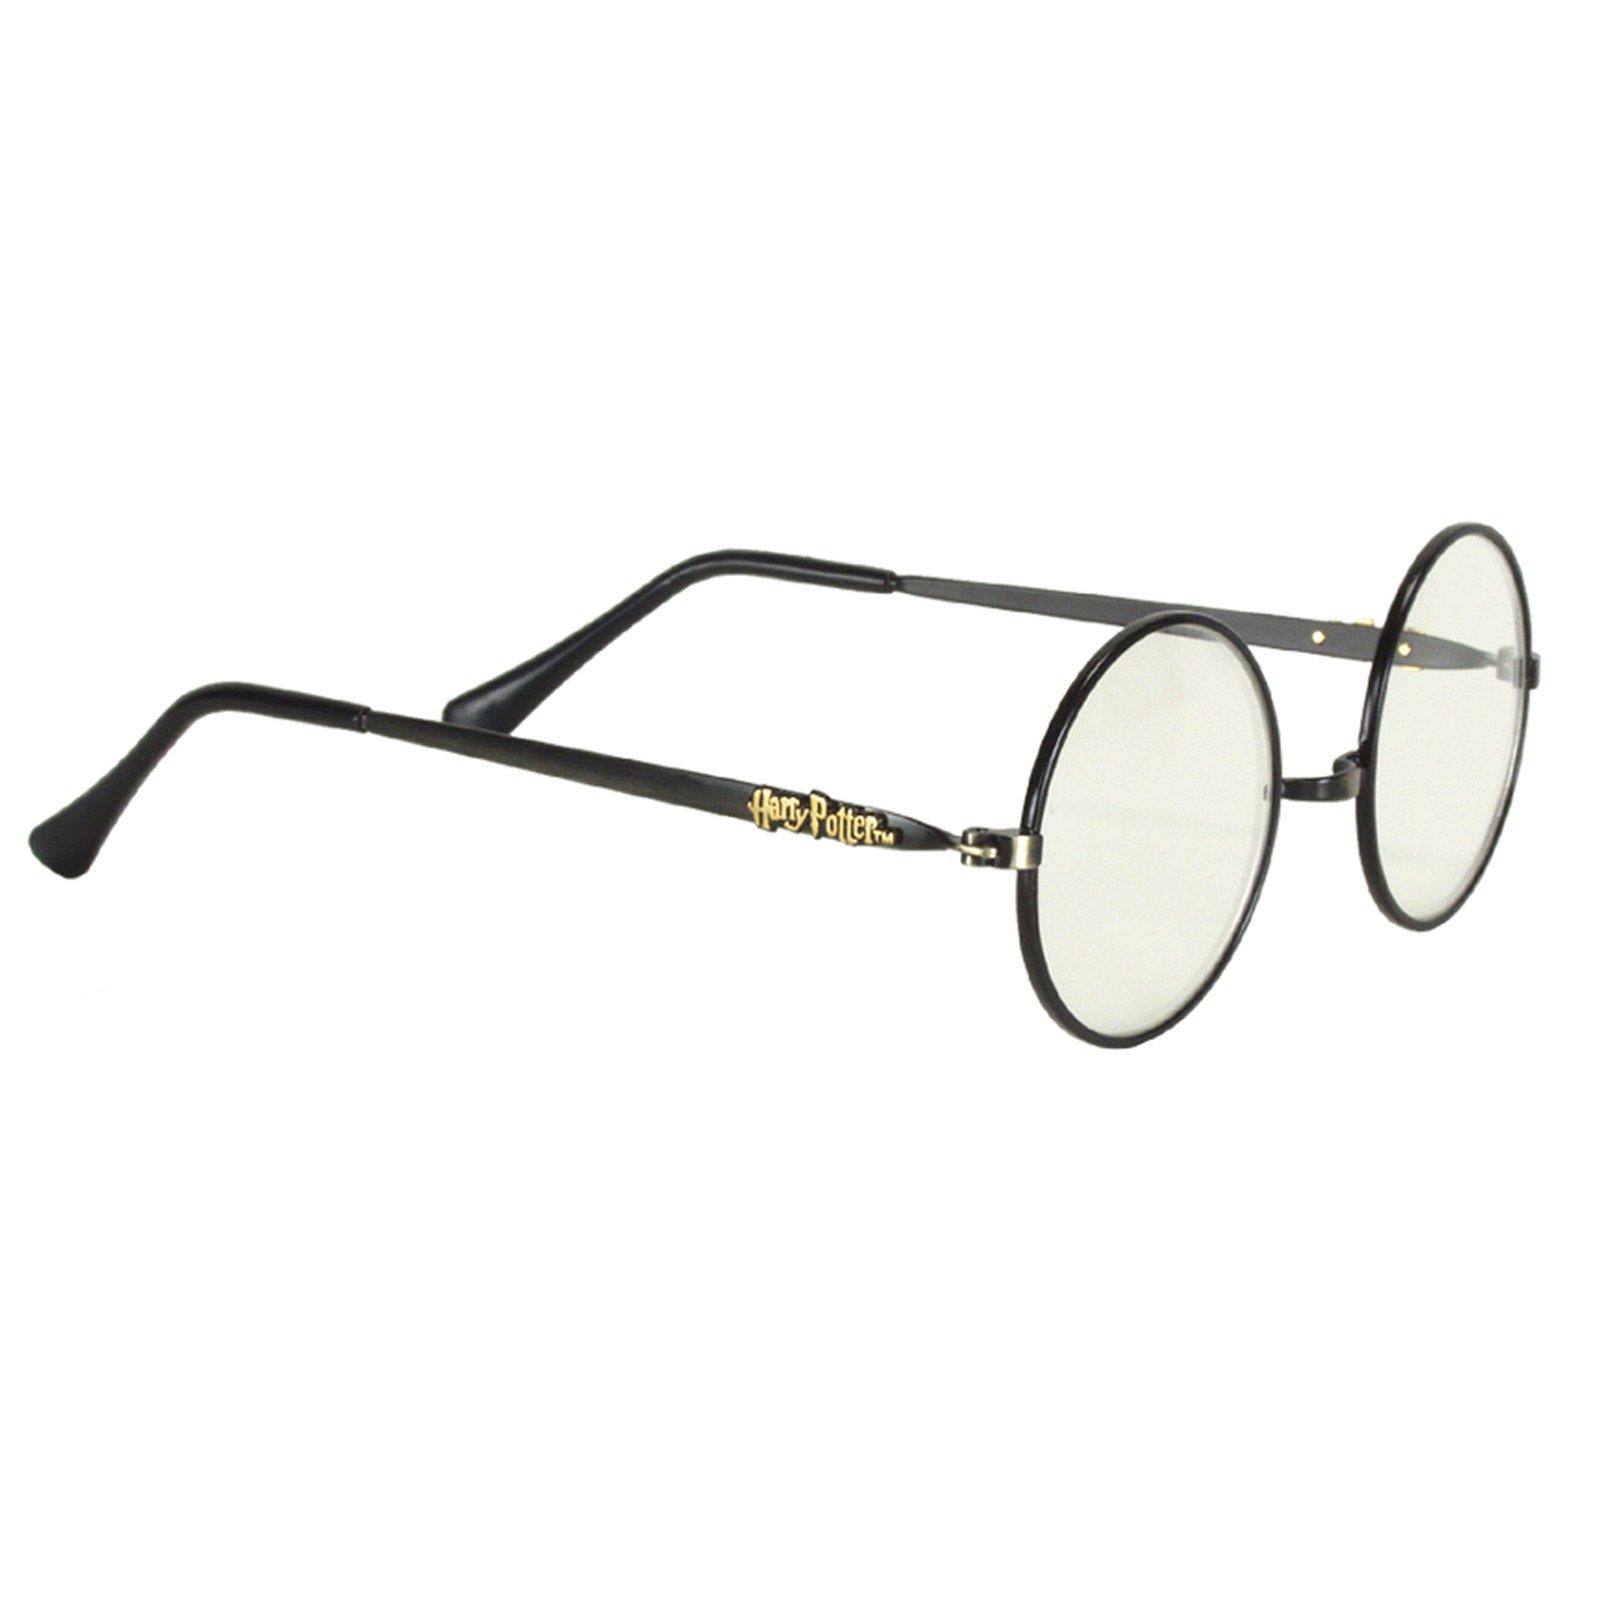 [occhiali+bisjpg]